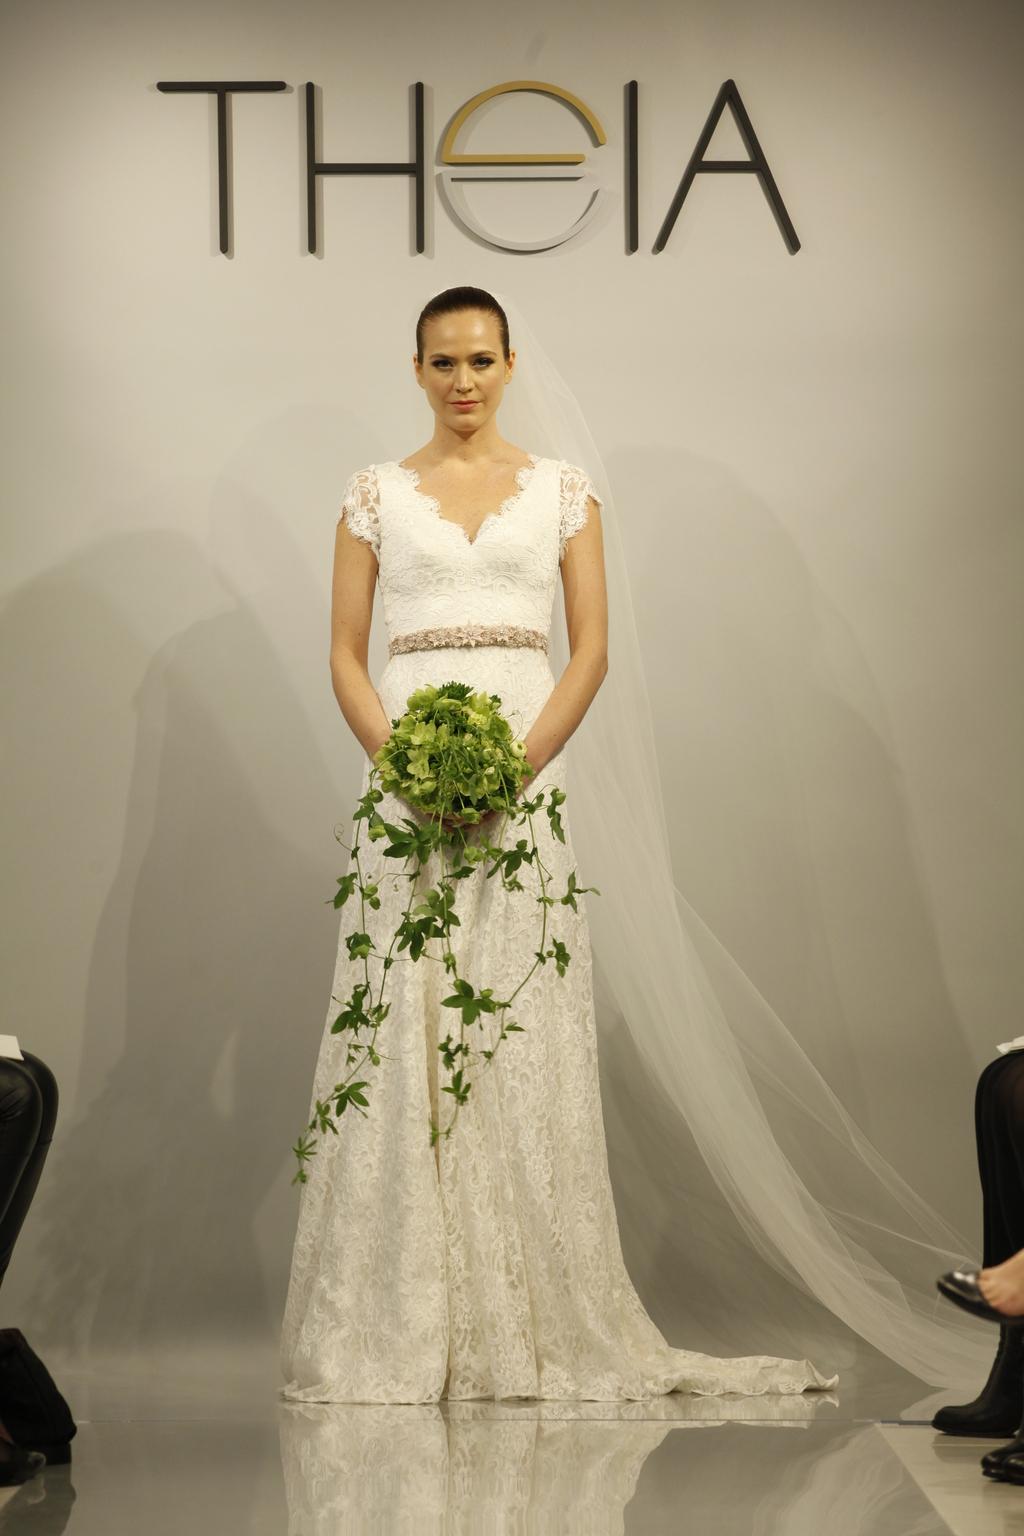 Theia-spring2014-wedding-dress-bridal-gown-louise.full